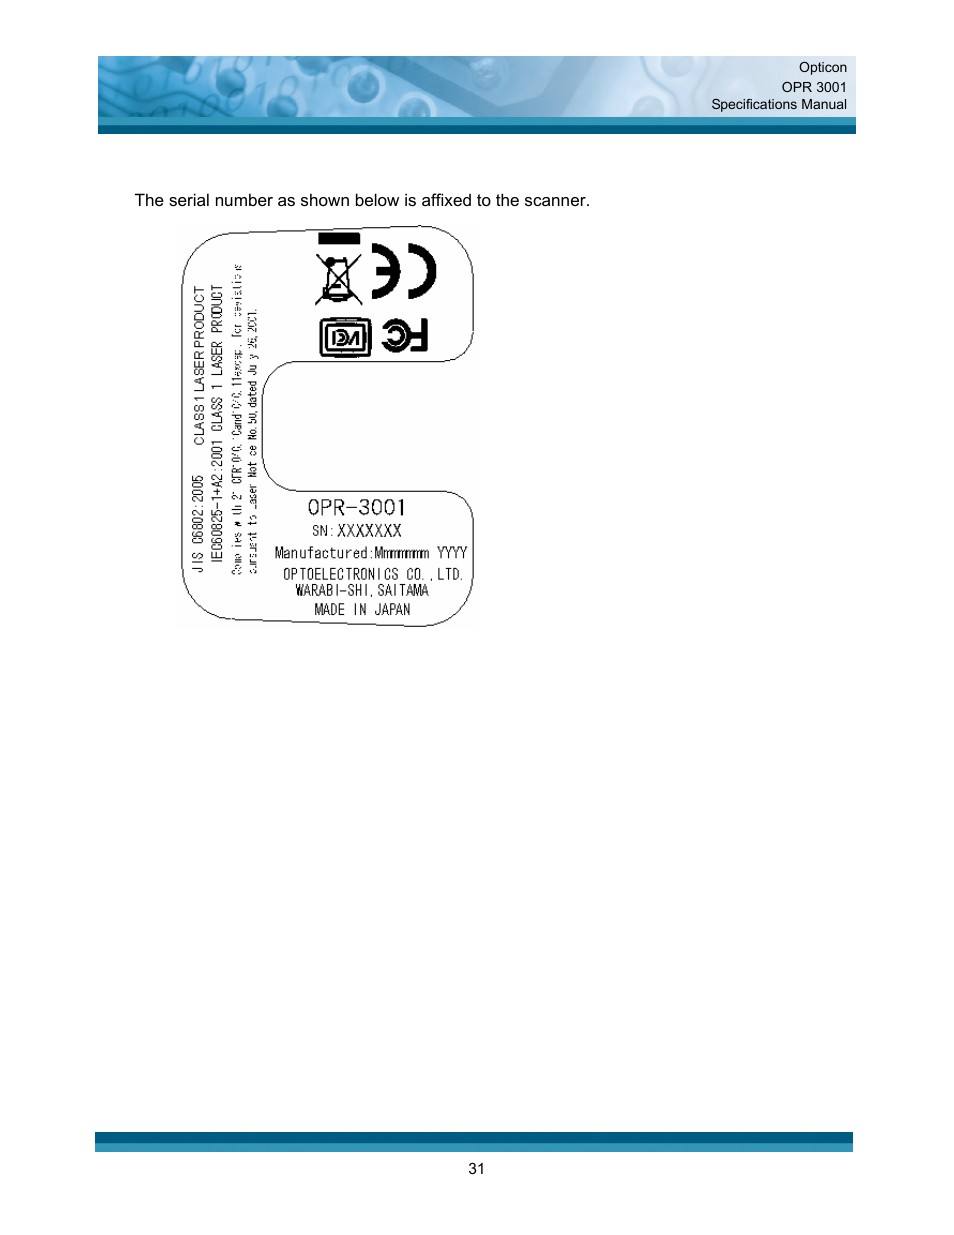 Opticon OPR 3001 User Manual